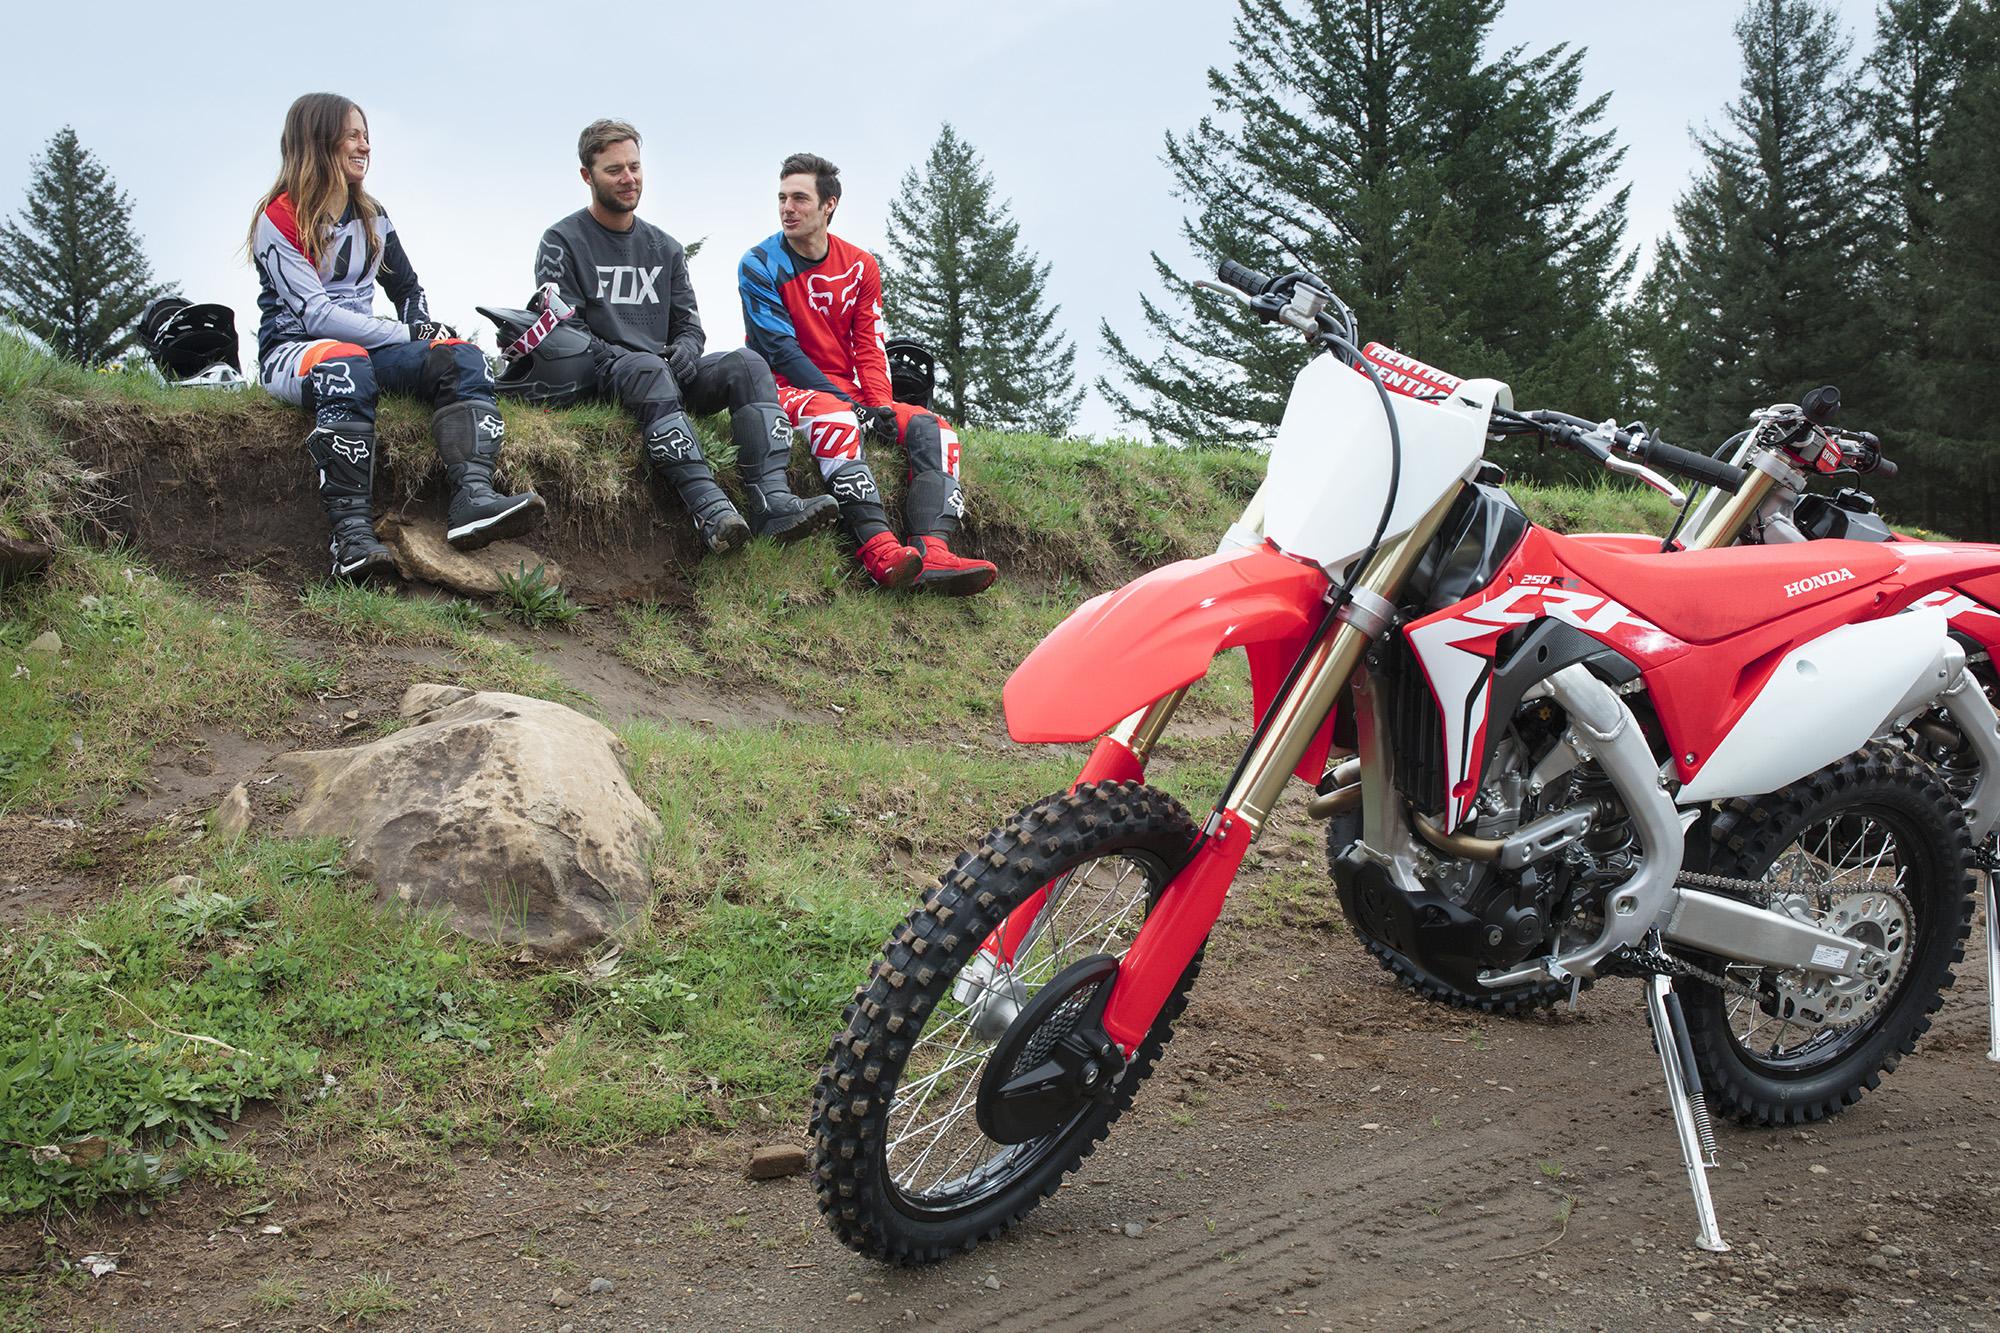 19 Honda CRF250RX_Lifestyle_4.jpg